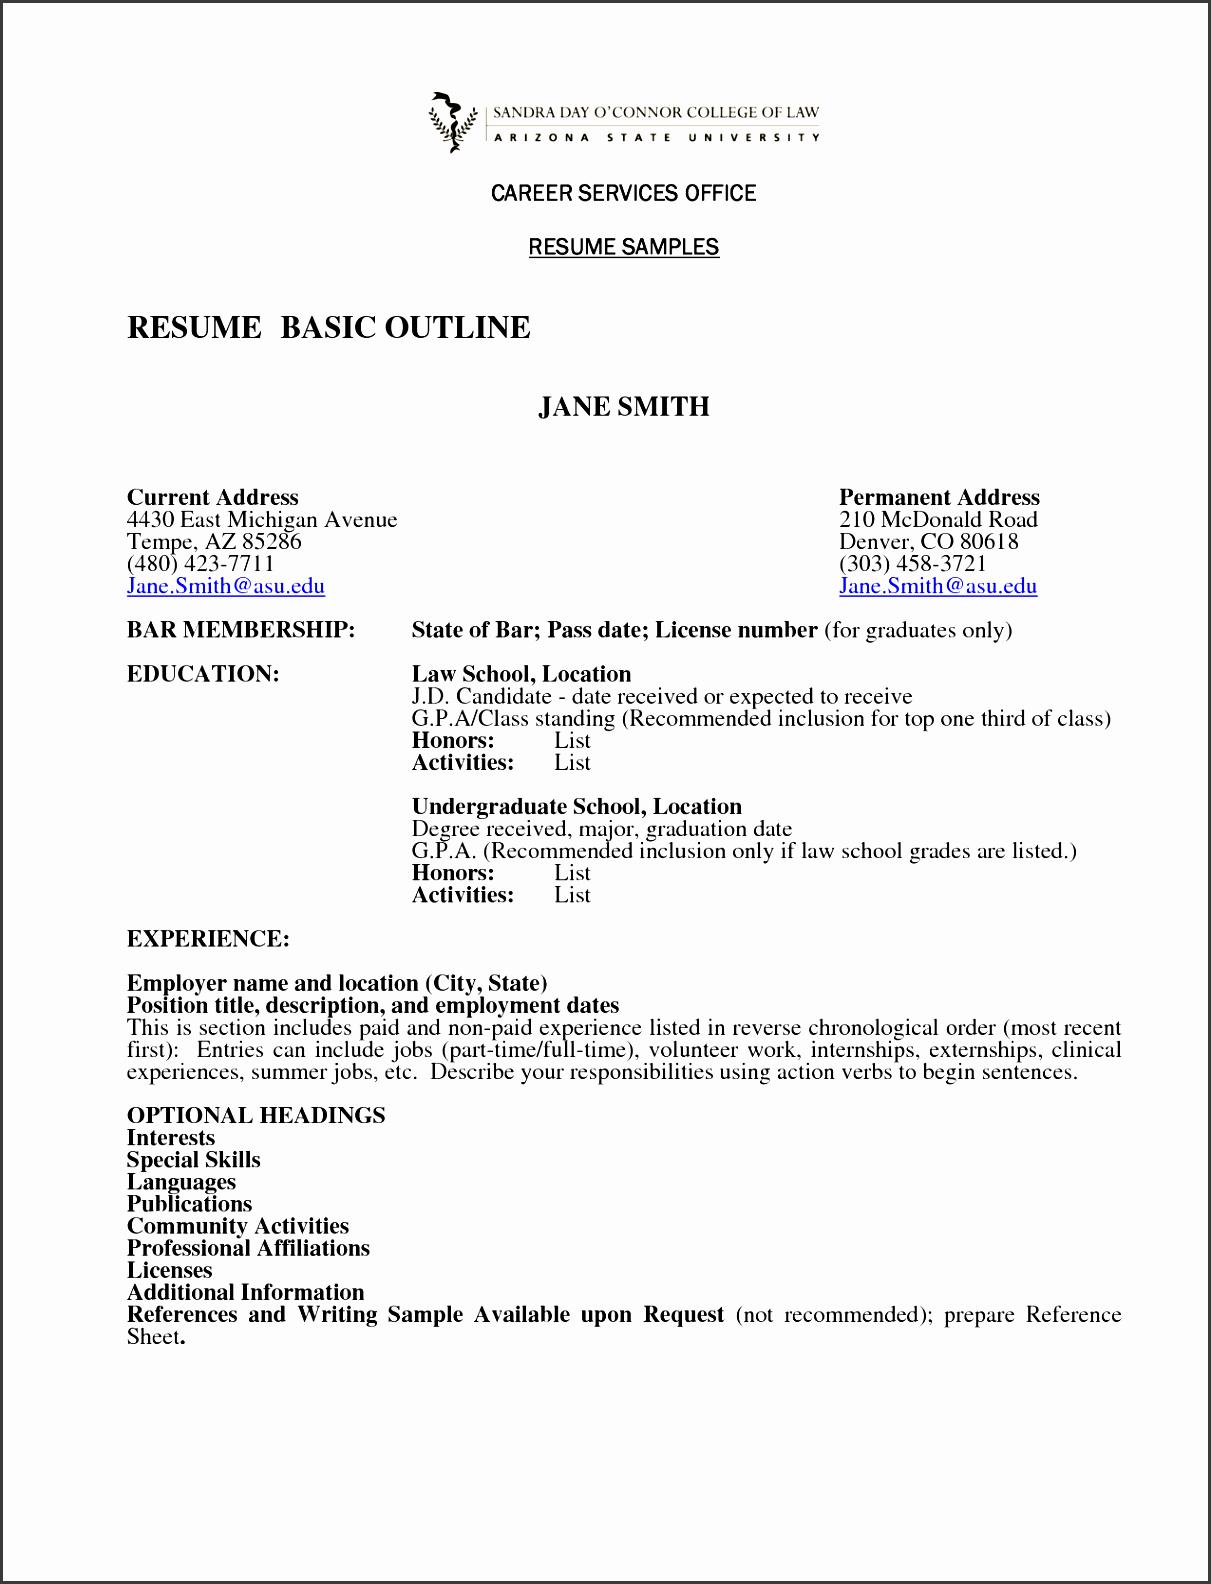 resume example resume template outline resume outline template resume outline template for word resume